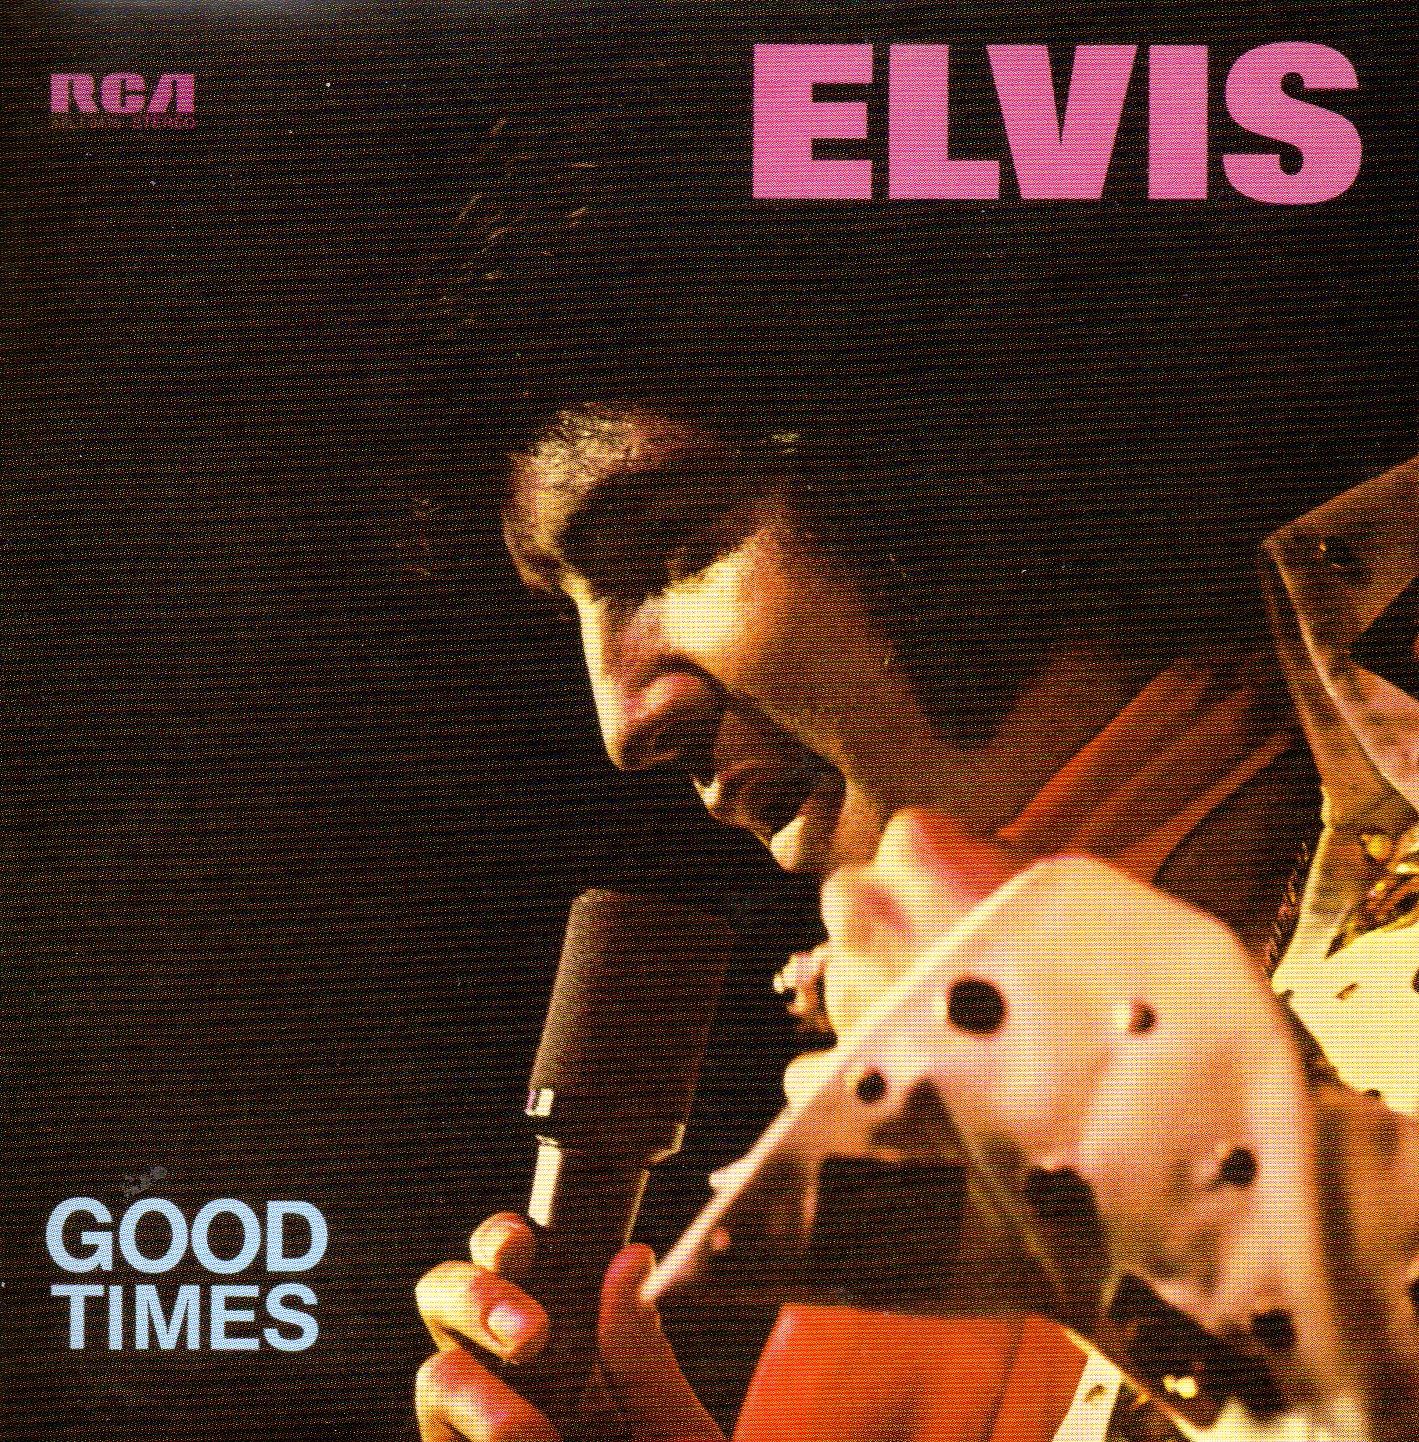 ELVIS PRESLEY - Good Times  (1974) - Mini LP REPLICA - 10-track CARD SLEEVE - CD